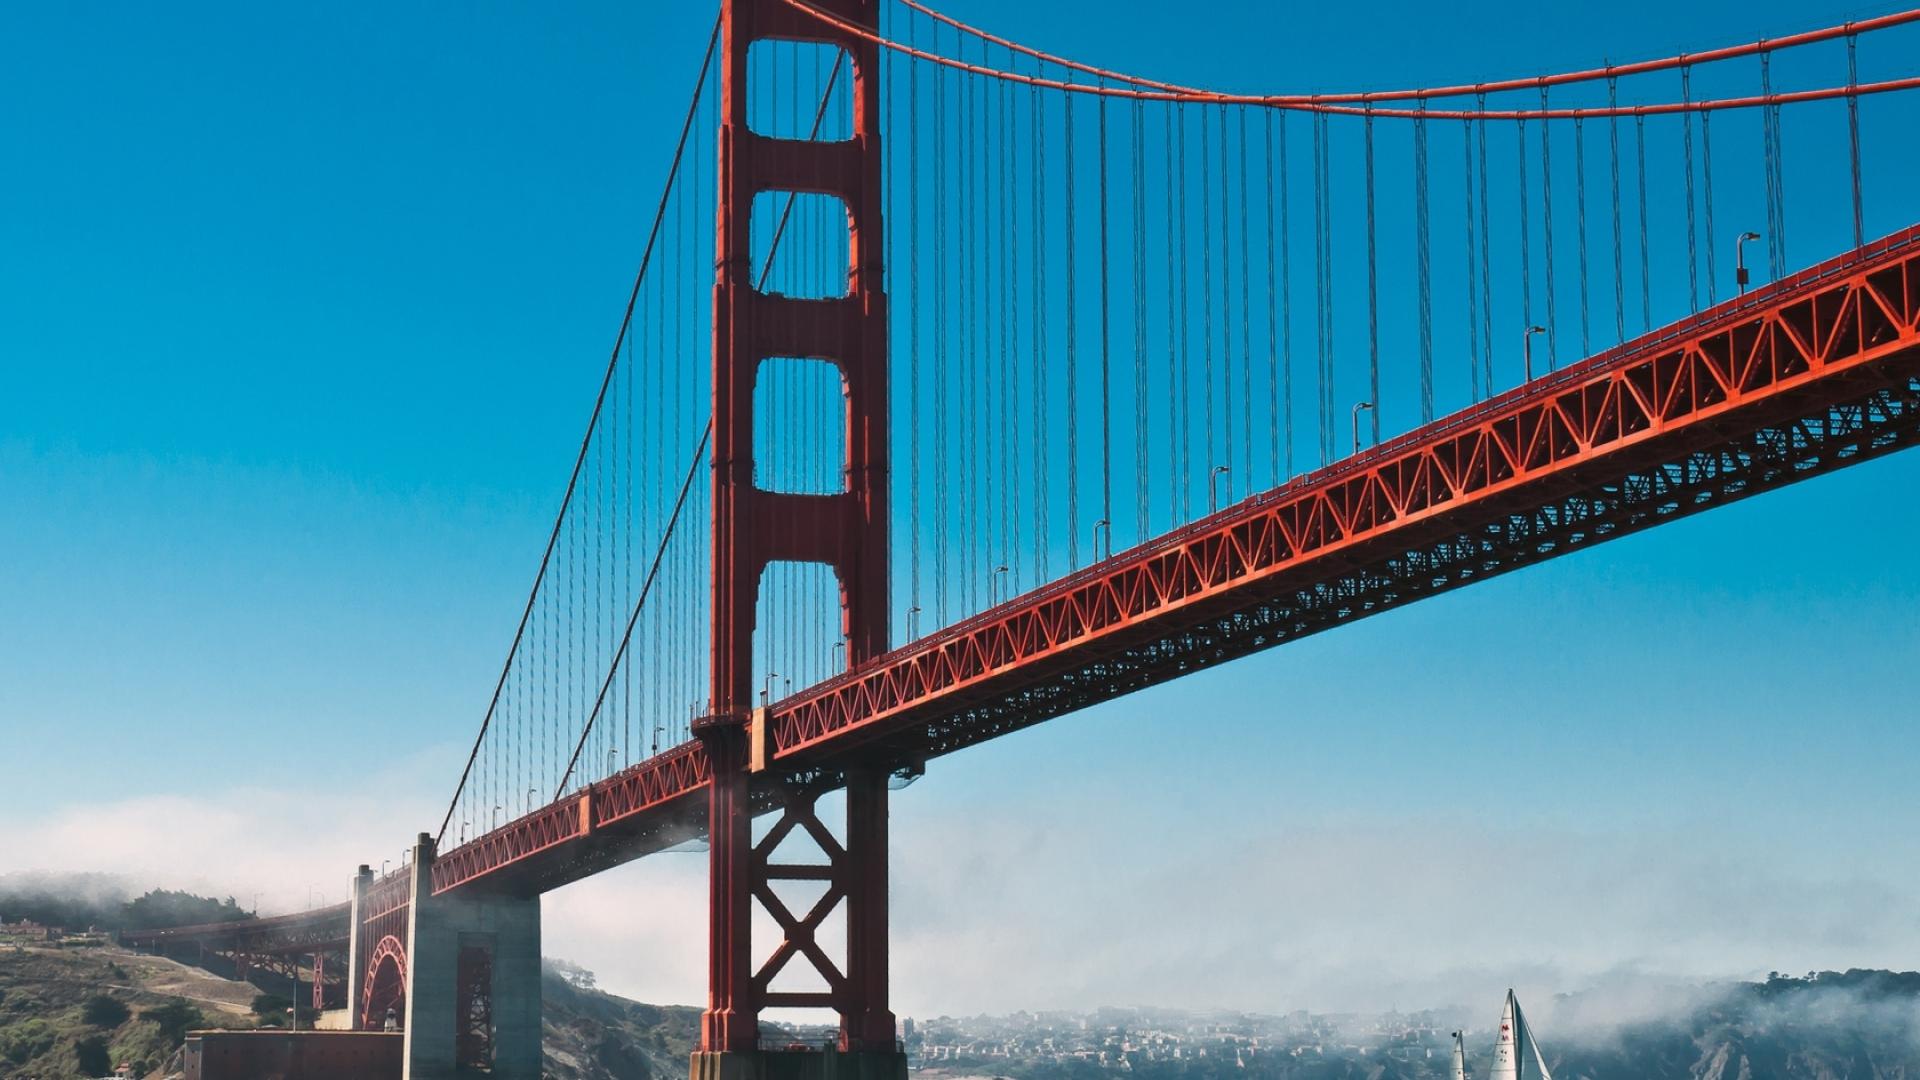 1920x1080 San Francisco Golden Gate Sailboat 1080p Laptop Full